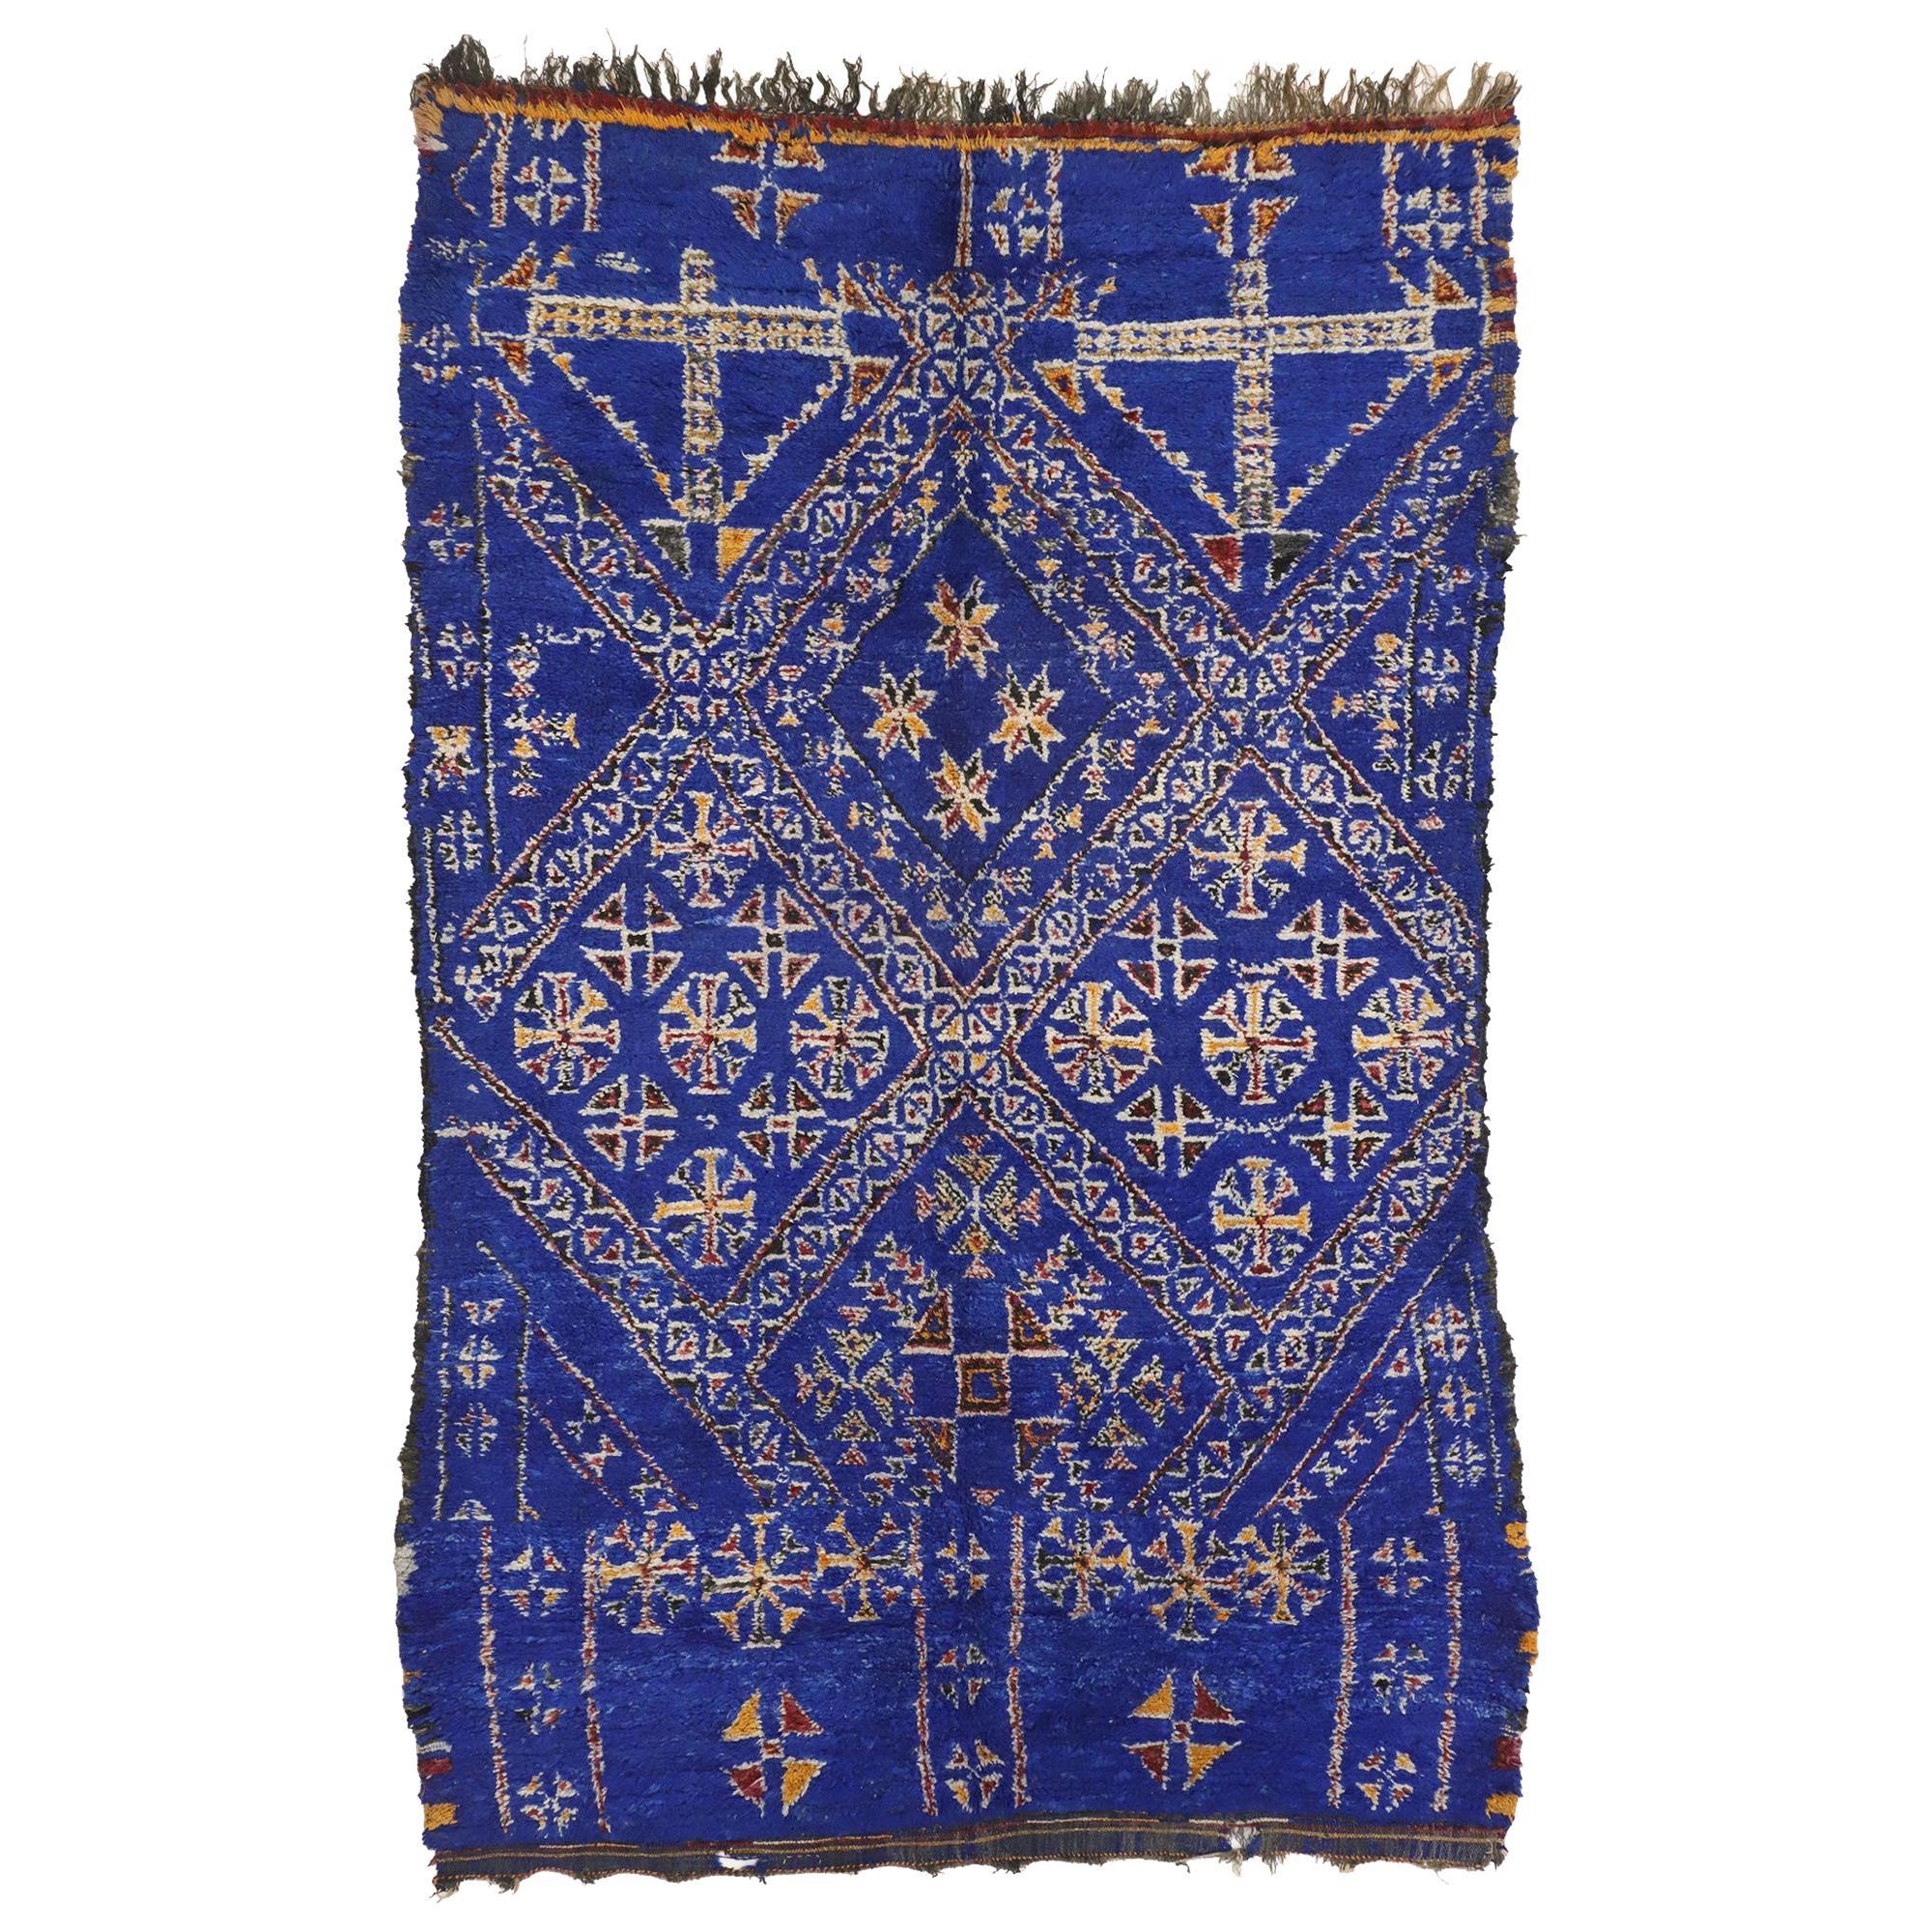 Vintage Indigo Beni Mguild Rug, Berber Blue Moroccan Rug with Tribal Style